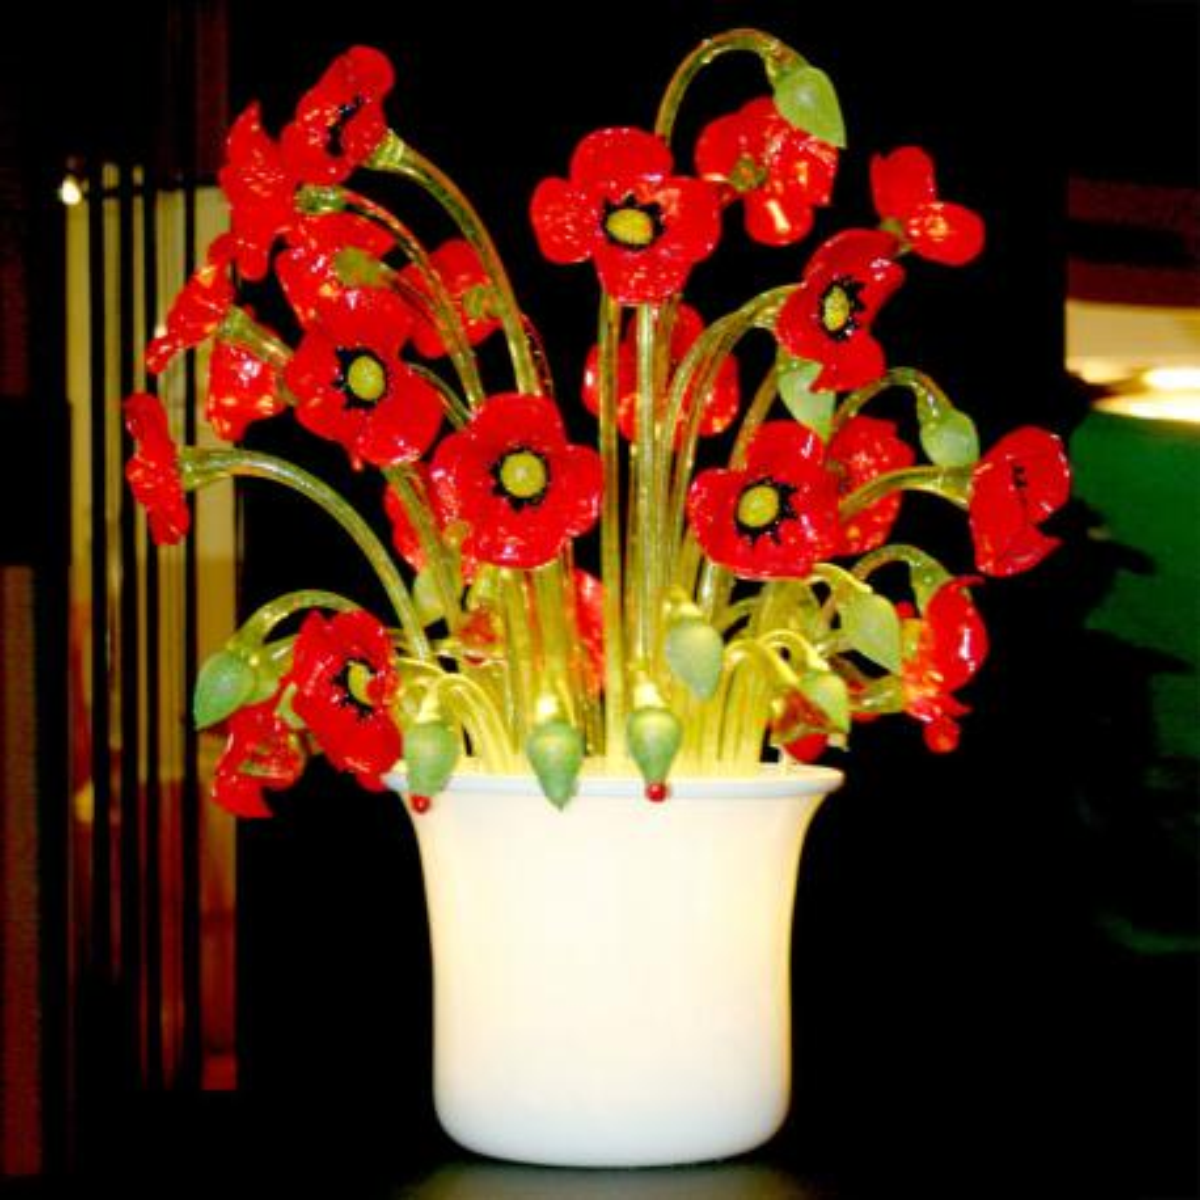 """Vaso di Papaveri"" lampe de table en verre de Murano - 1 lumière - rouge"